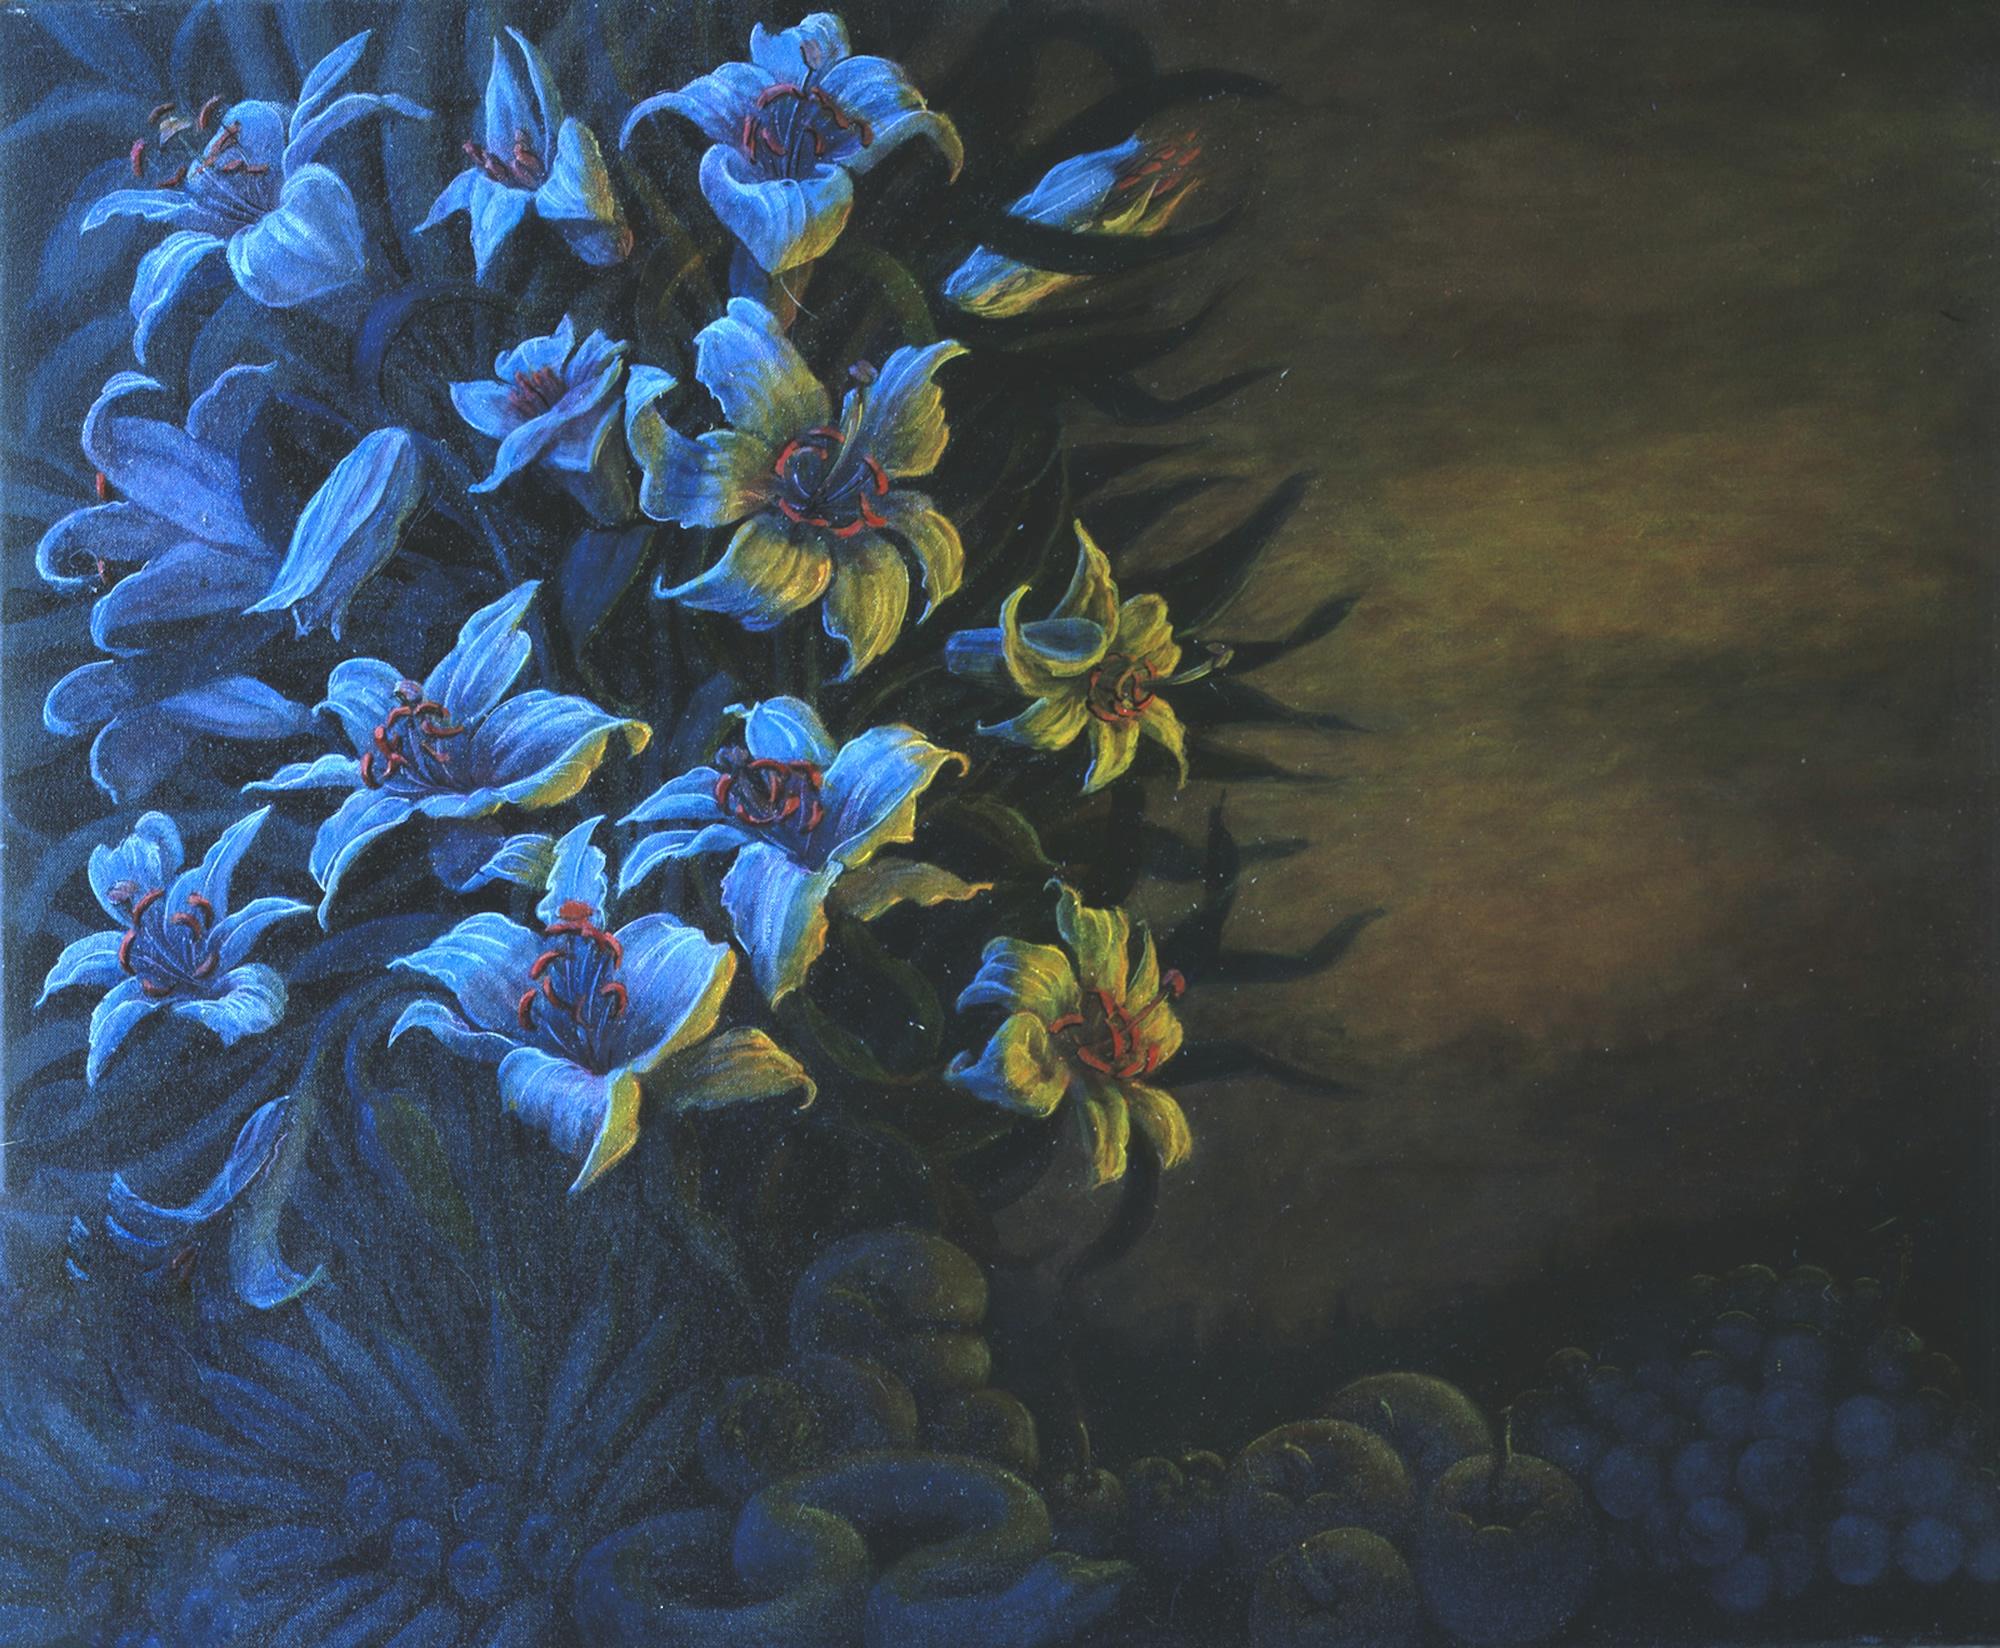 Millenium lilies